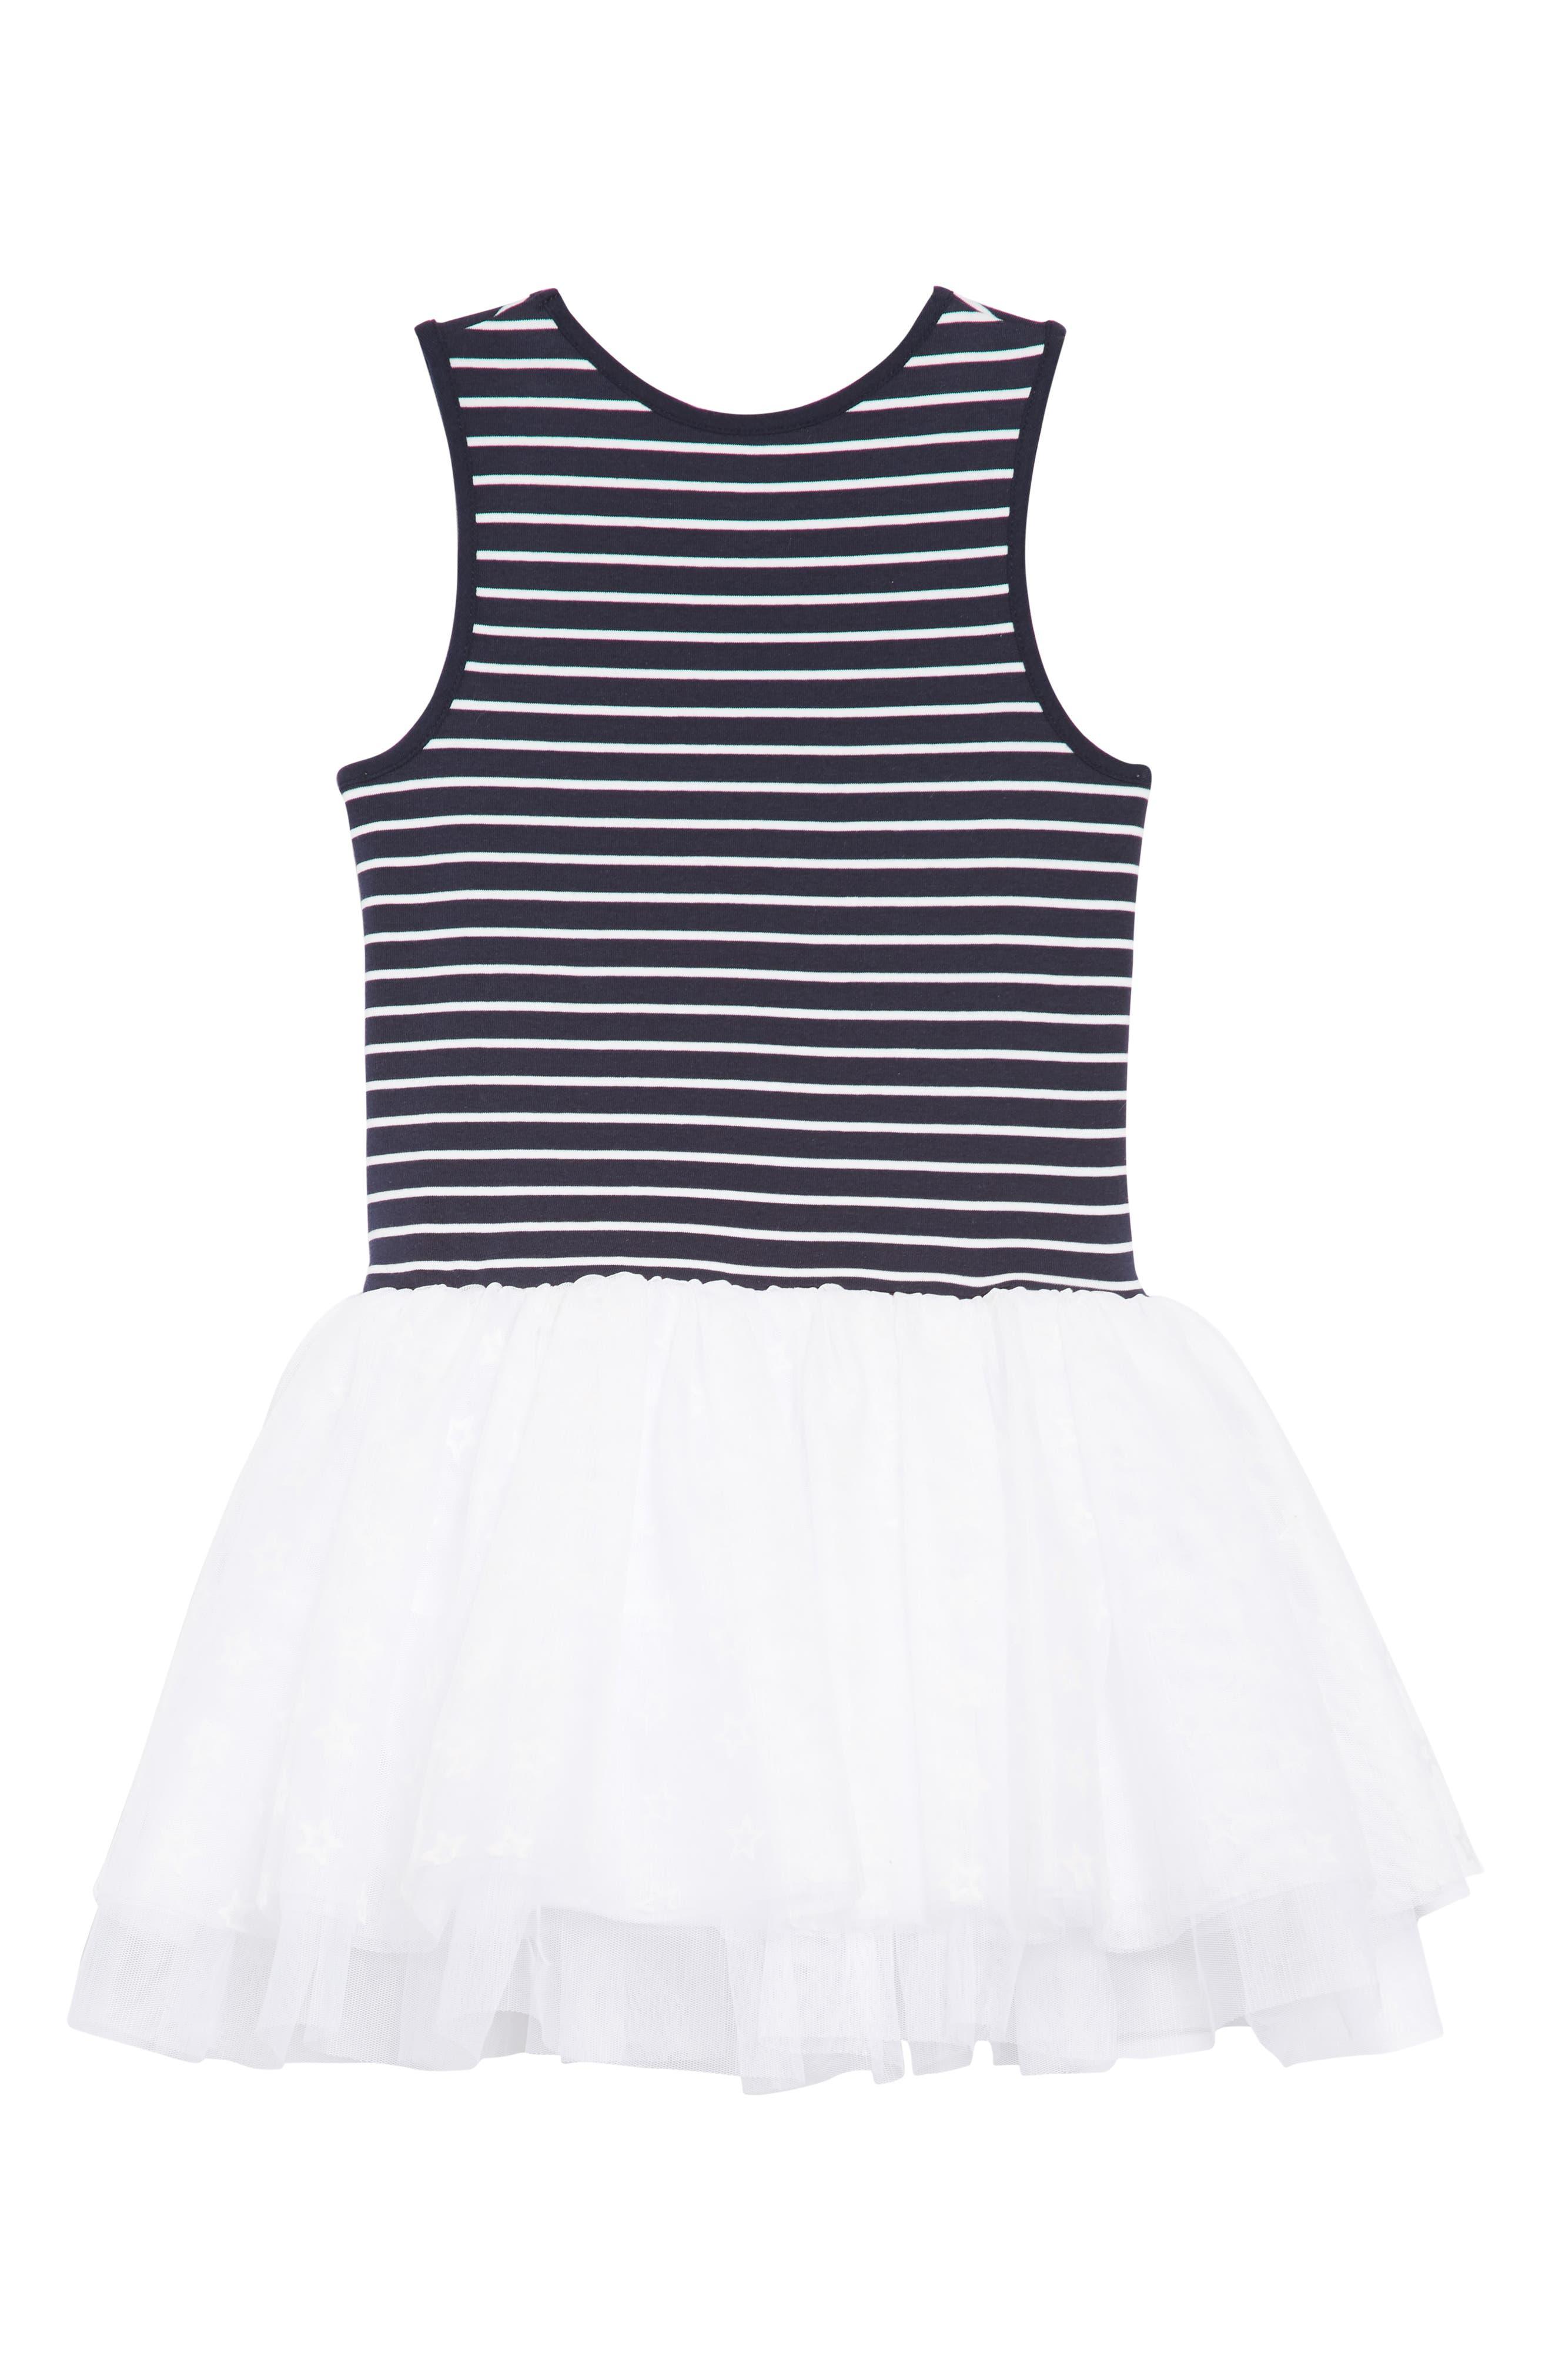 Stars & Stripes Tutu Dress,                             Alternate thumbnail 2, color,                             Navy/ White